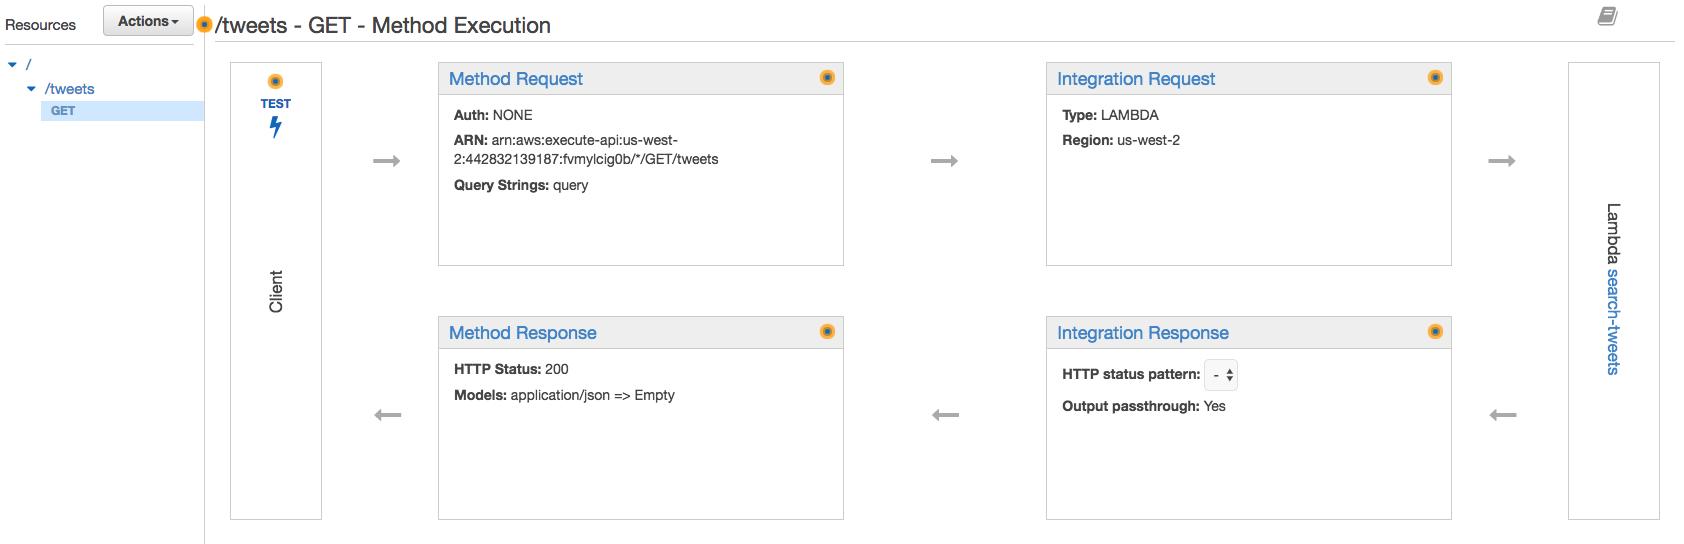 Sending push notifications via Firebase using AWS Lambda